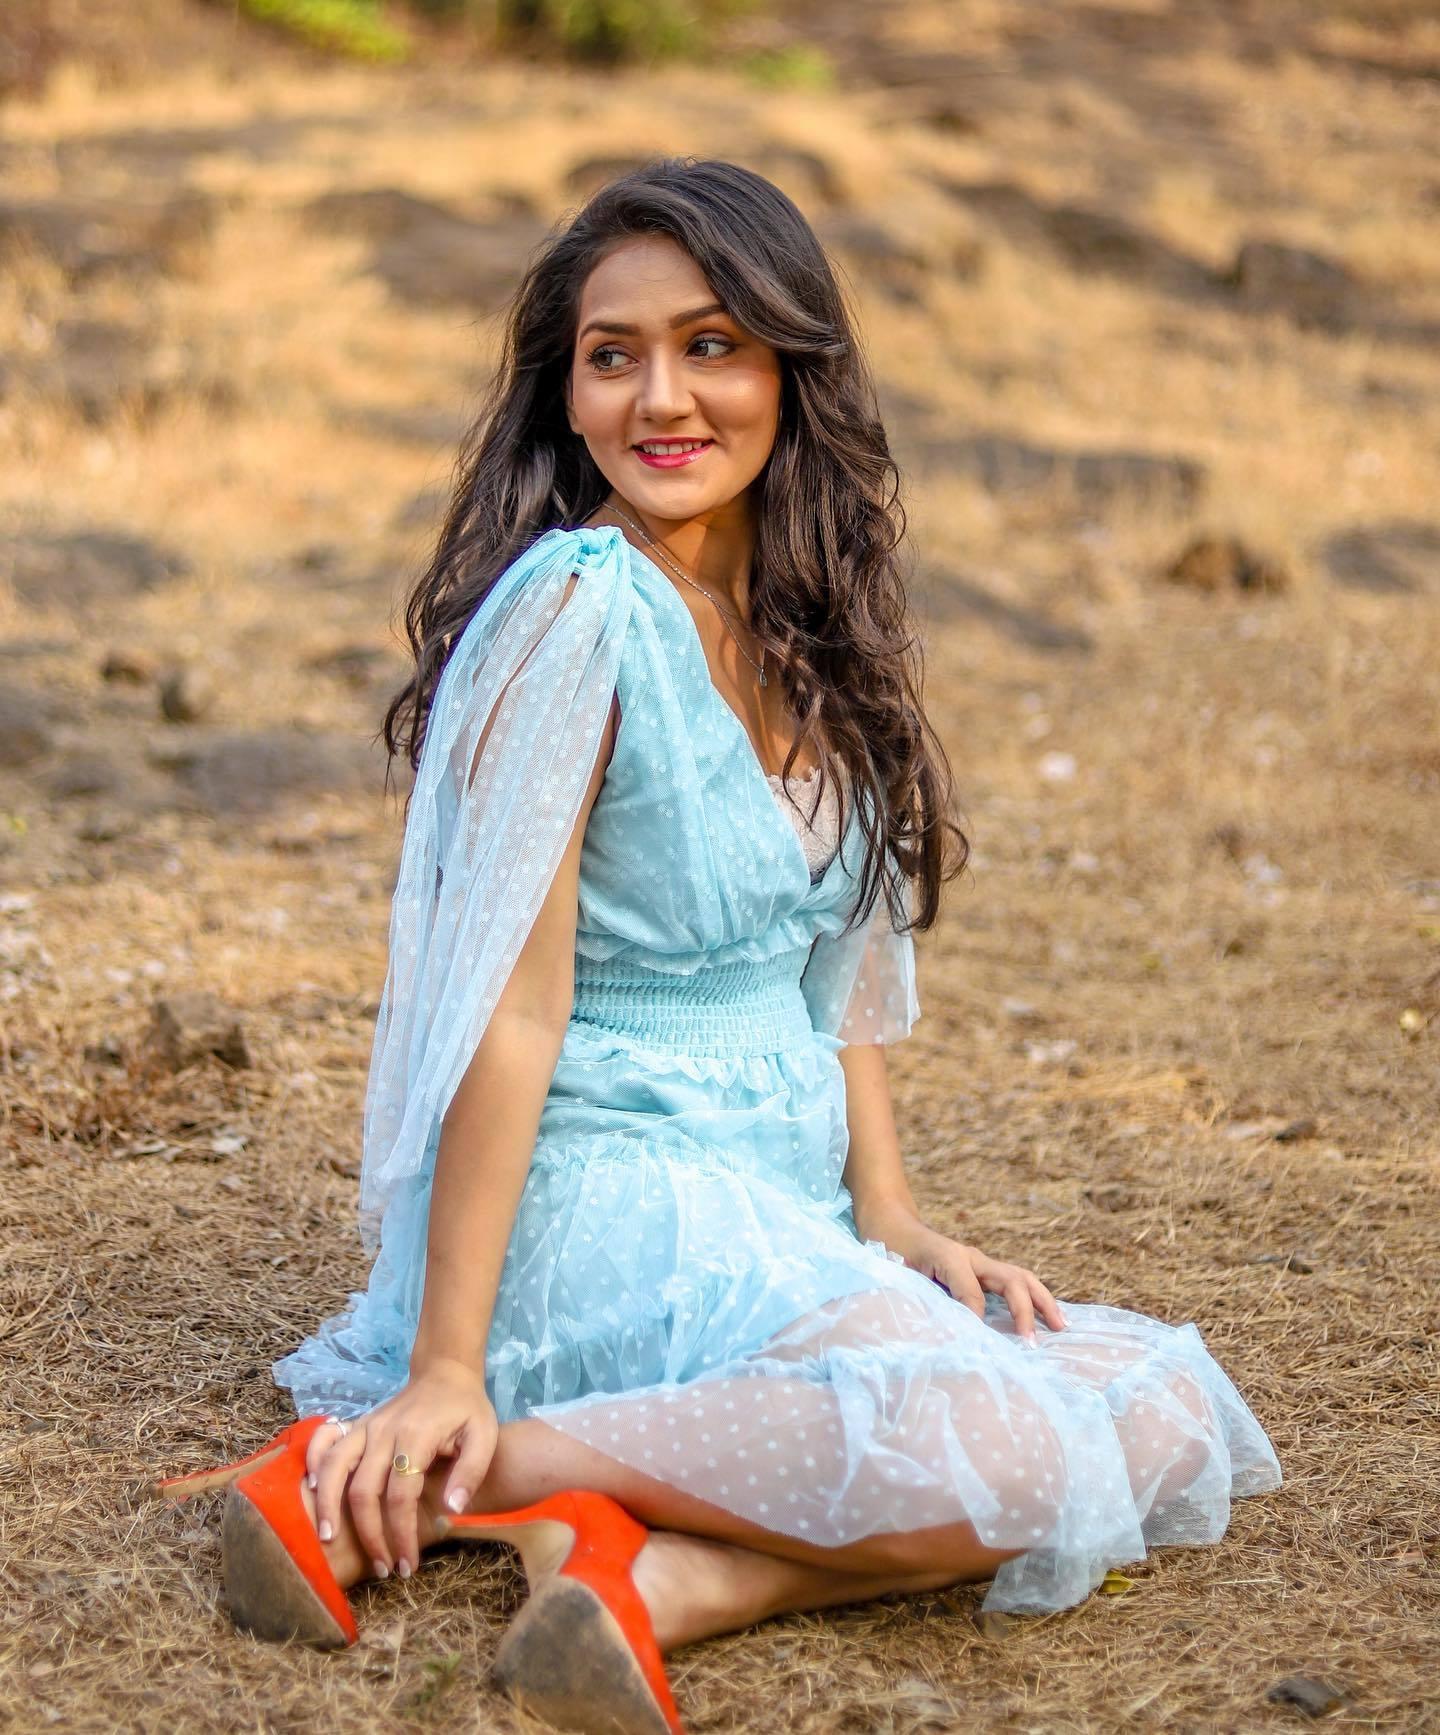 Kritika Sharma Profile  Contact Details (Phone number, Instagram, Twitter, Facebook)